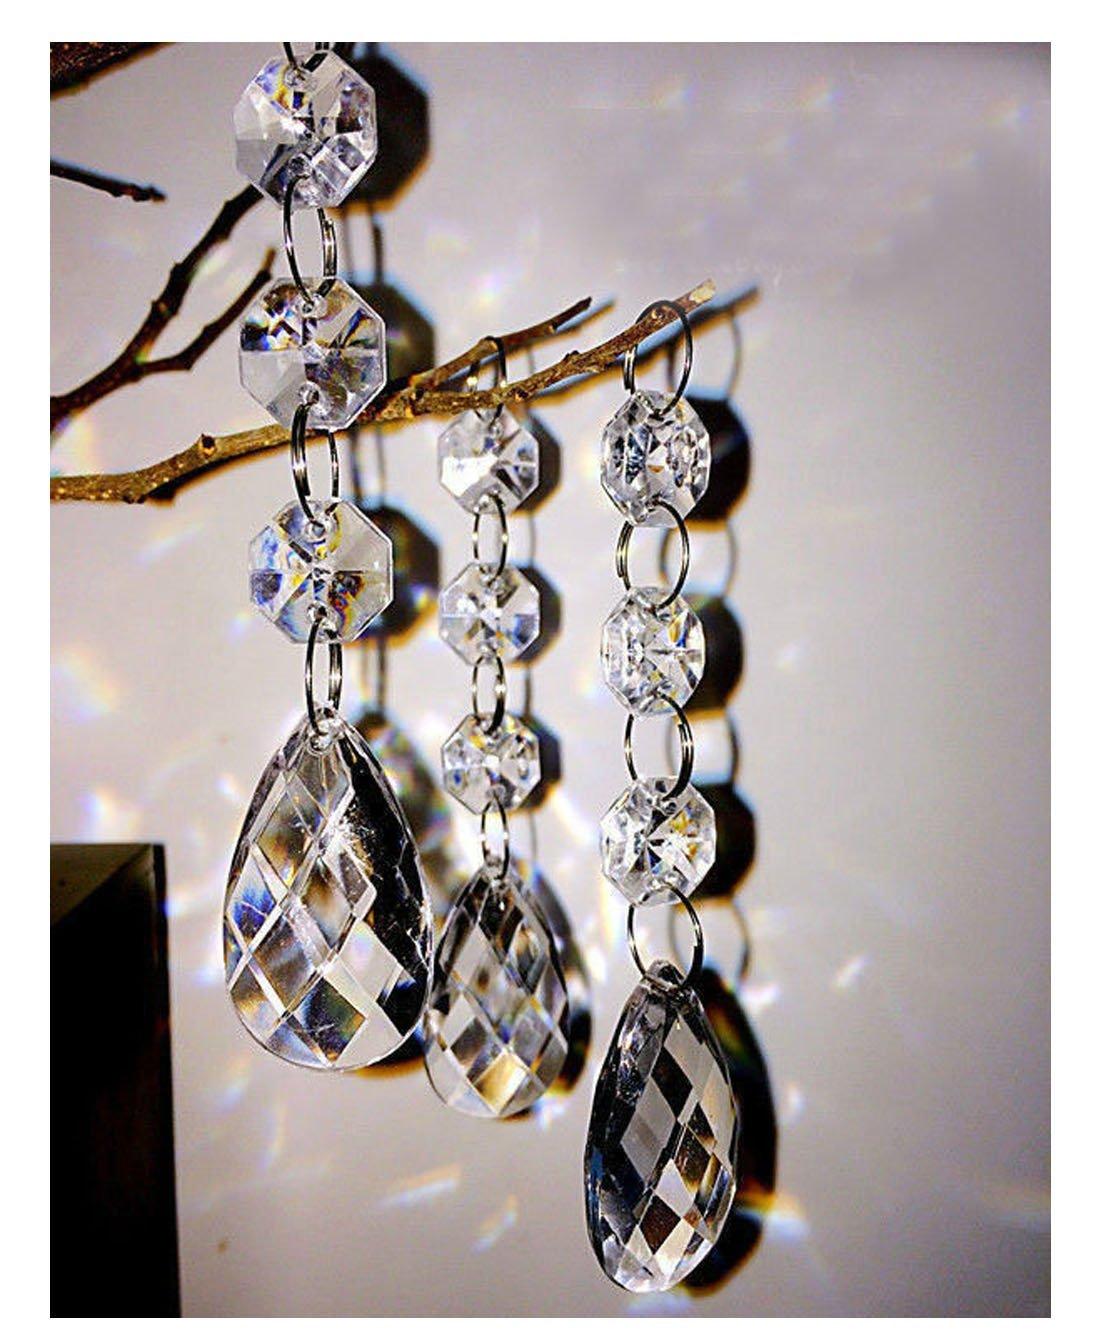 30PCS Teardrop Acrylic Crystal Beads Beads Garland Chandelier Hanging Wedding Party Decor